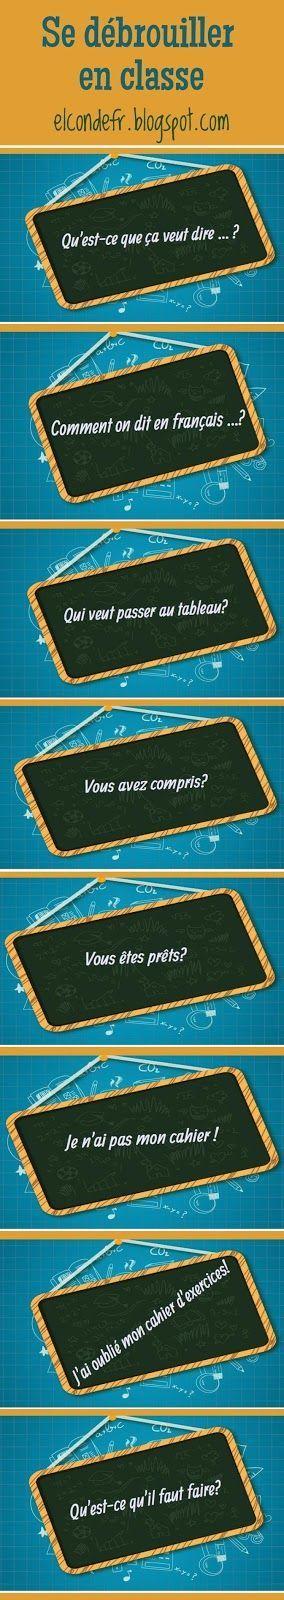 French Classroom Essential Questions/Expressions. Se débrouiller en classe